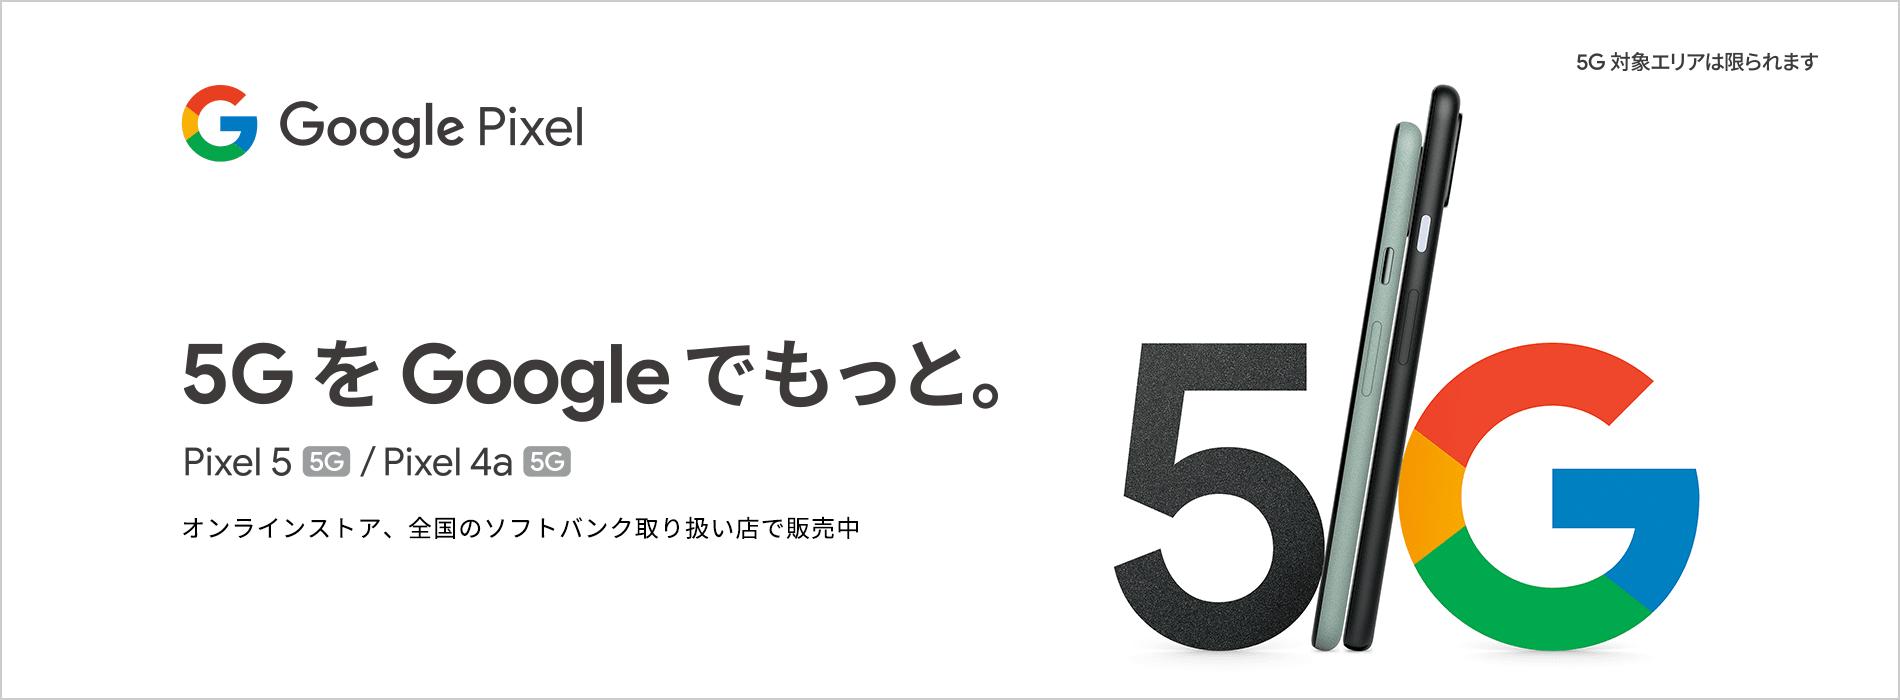 5G を Google でもっと。Pixel 5 (5G) / Pixel 4a (5G) オンラインストア、全国のソフトバンク取り扱い店で販売中 5G対象エリアは限られます